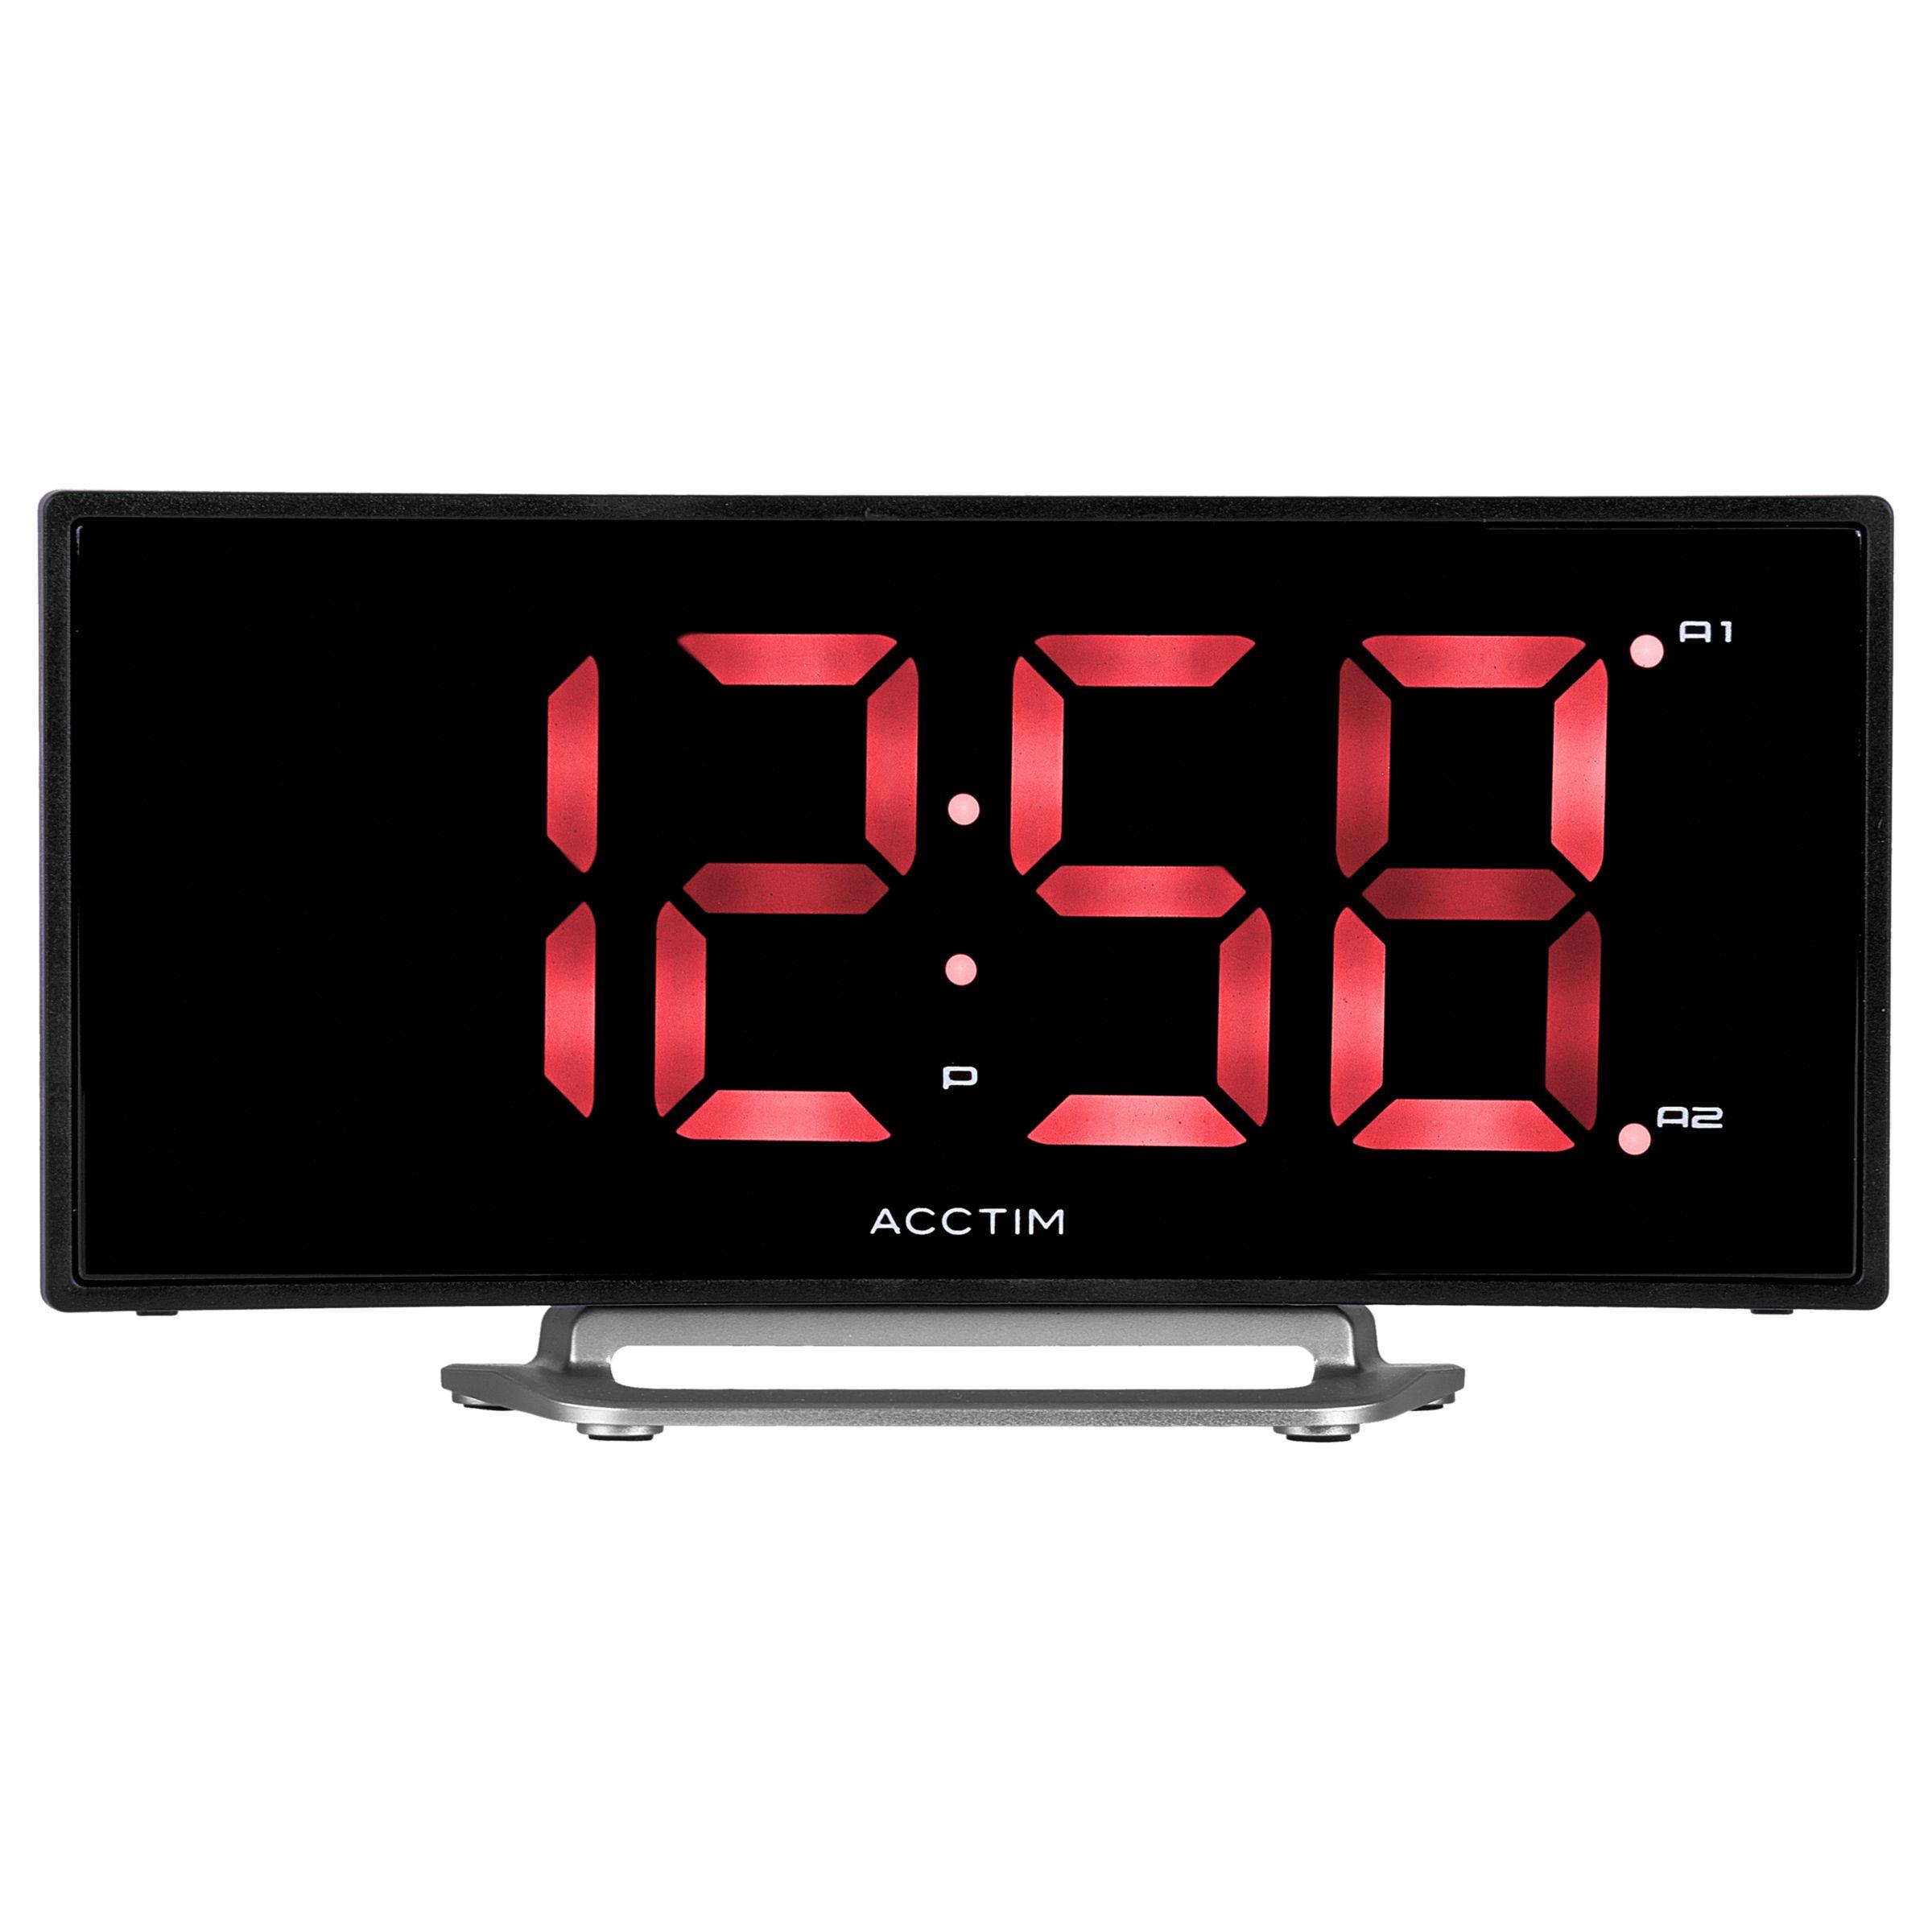 Acctim Acctim Sierra Curved LED Alarm Clock, Black